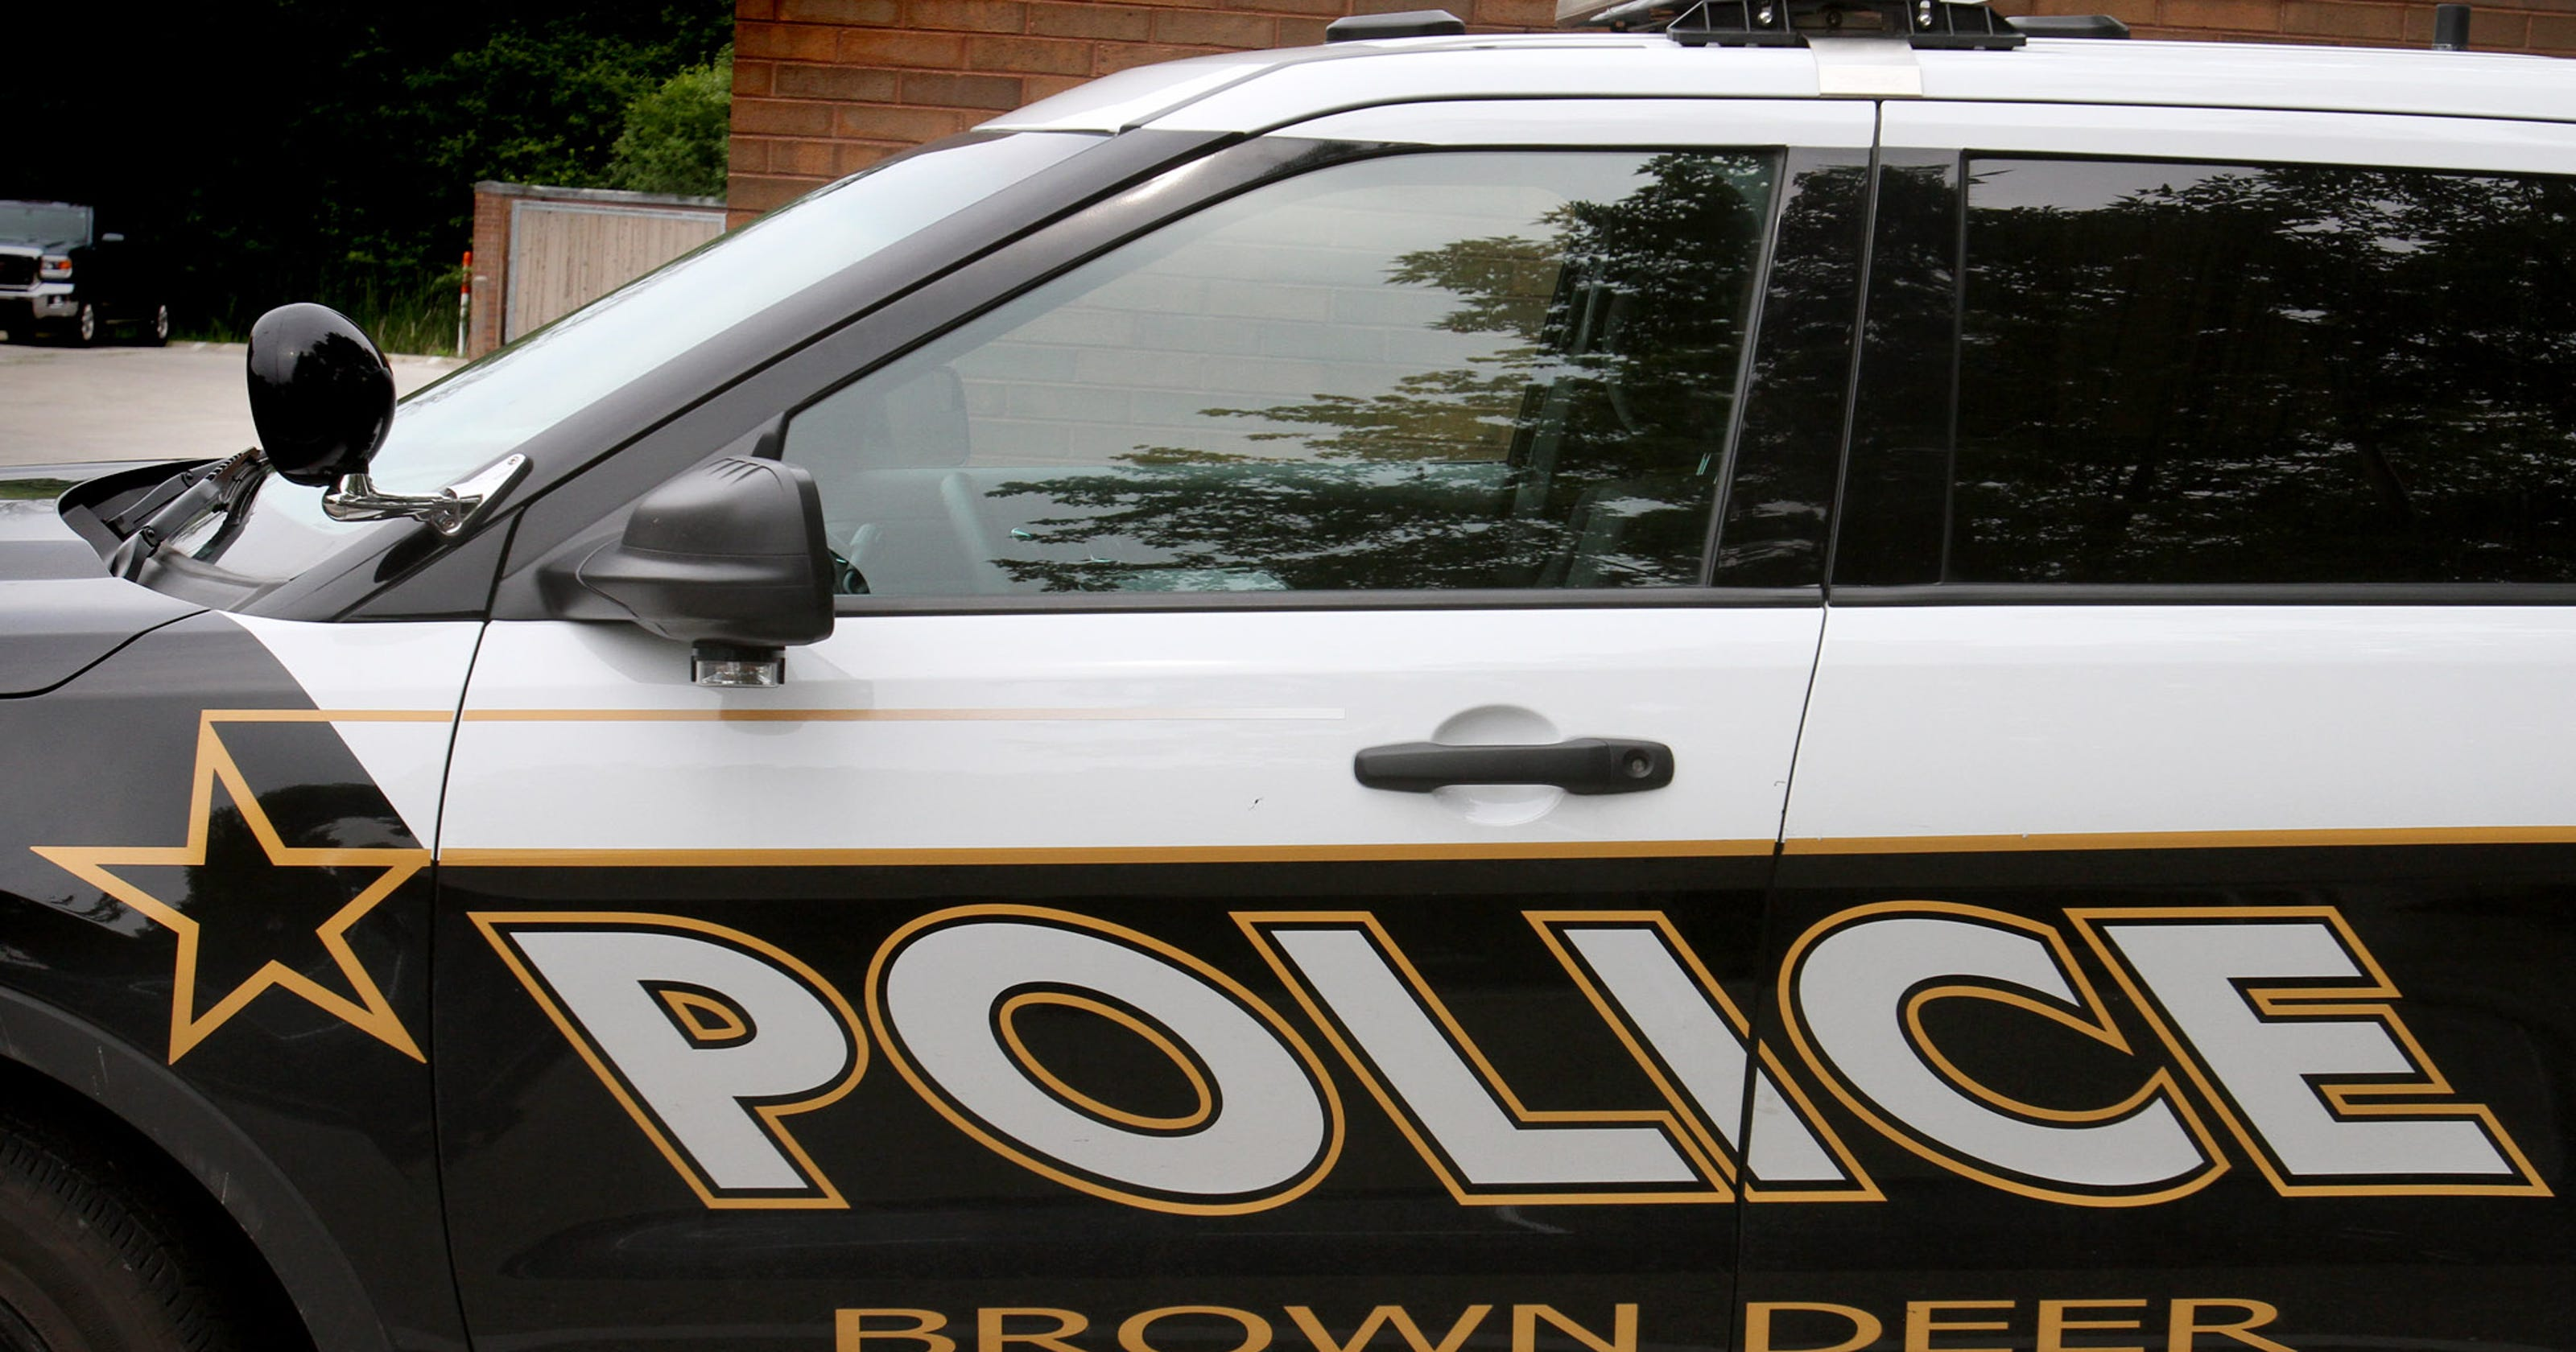 Stolen car crashes after police chase in Brown Deer